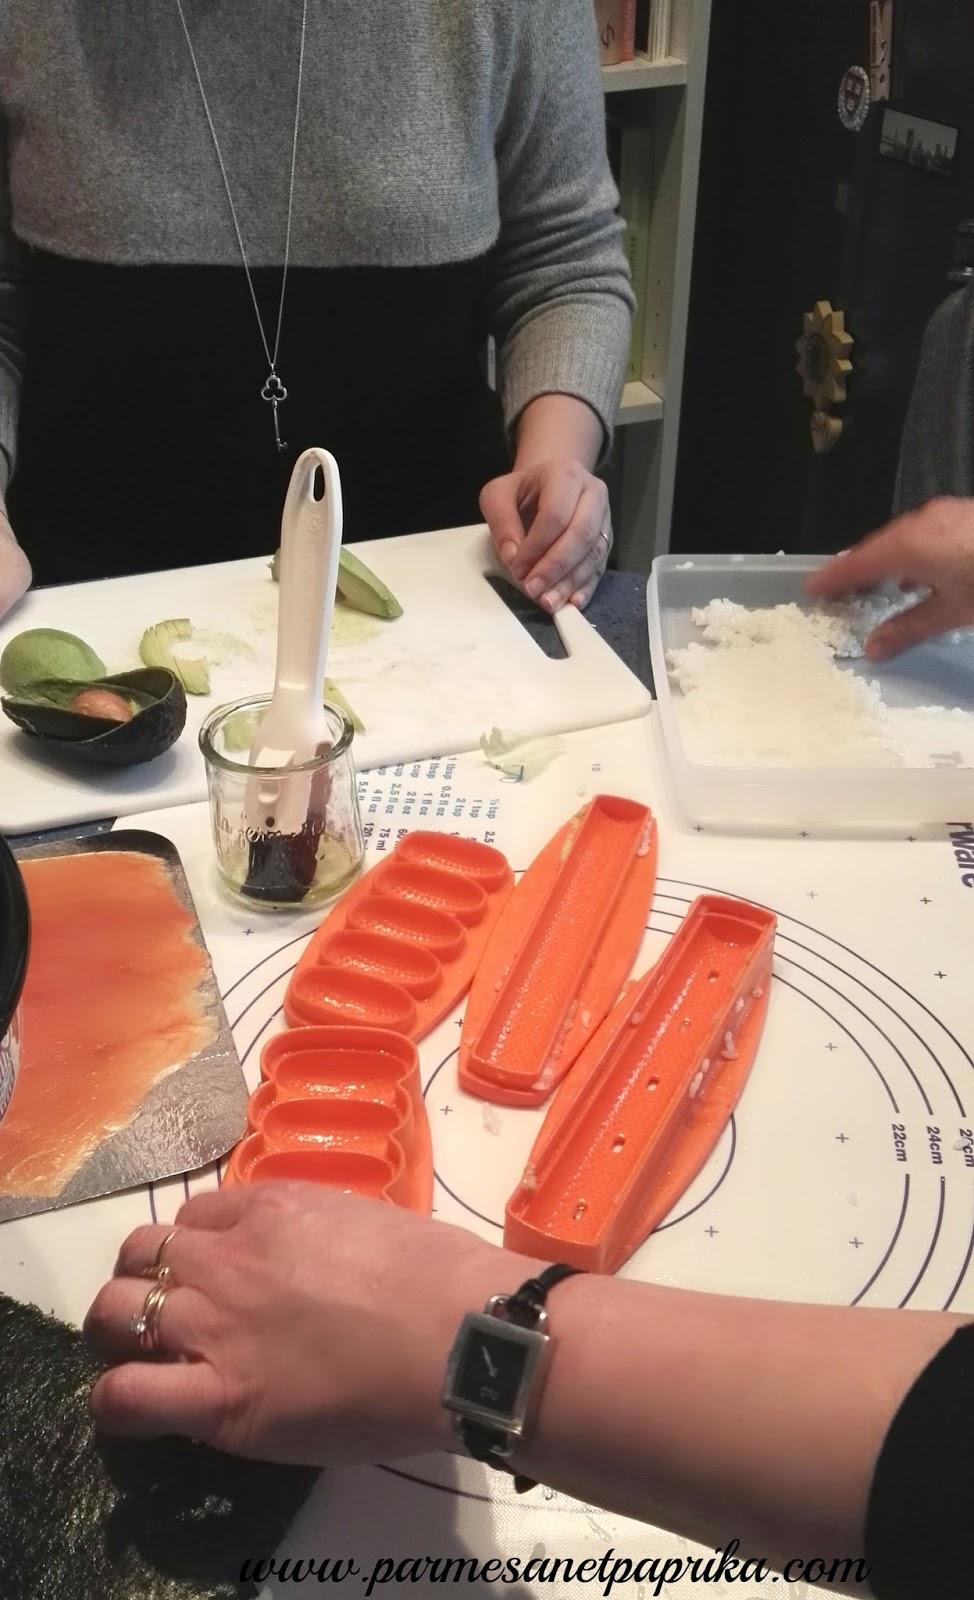 Atelier culinaire tupperware sushi et maki au programme - Atelier cuisine tupperware ...